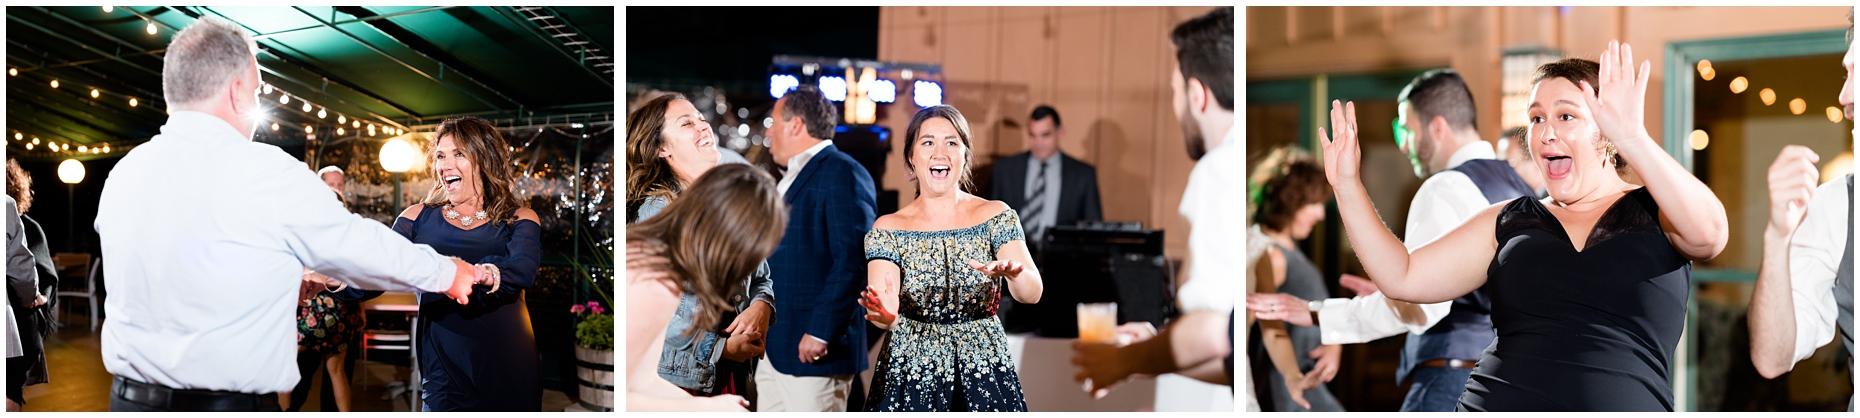 matt_andrea_glenora_wine_cellars_finger_lakes_vineyard_wedding_photography